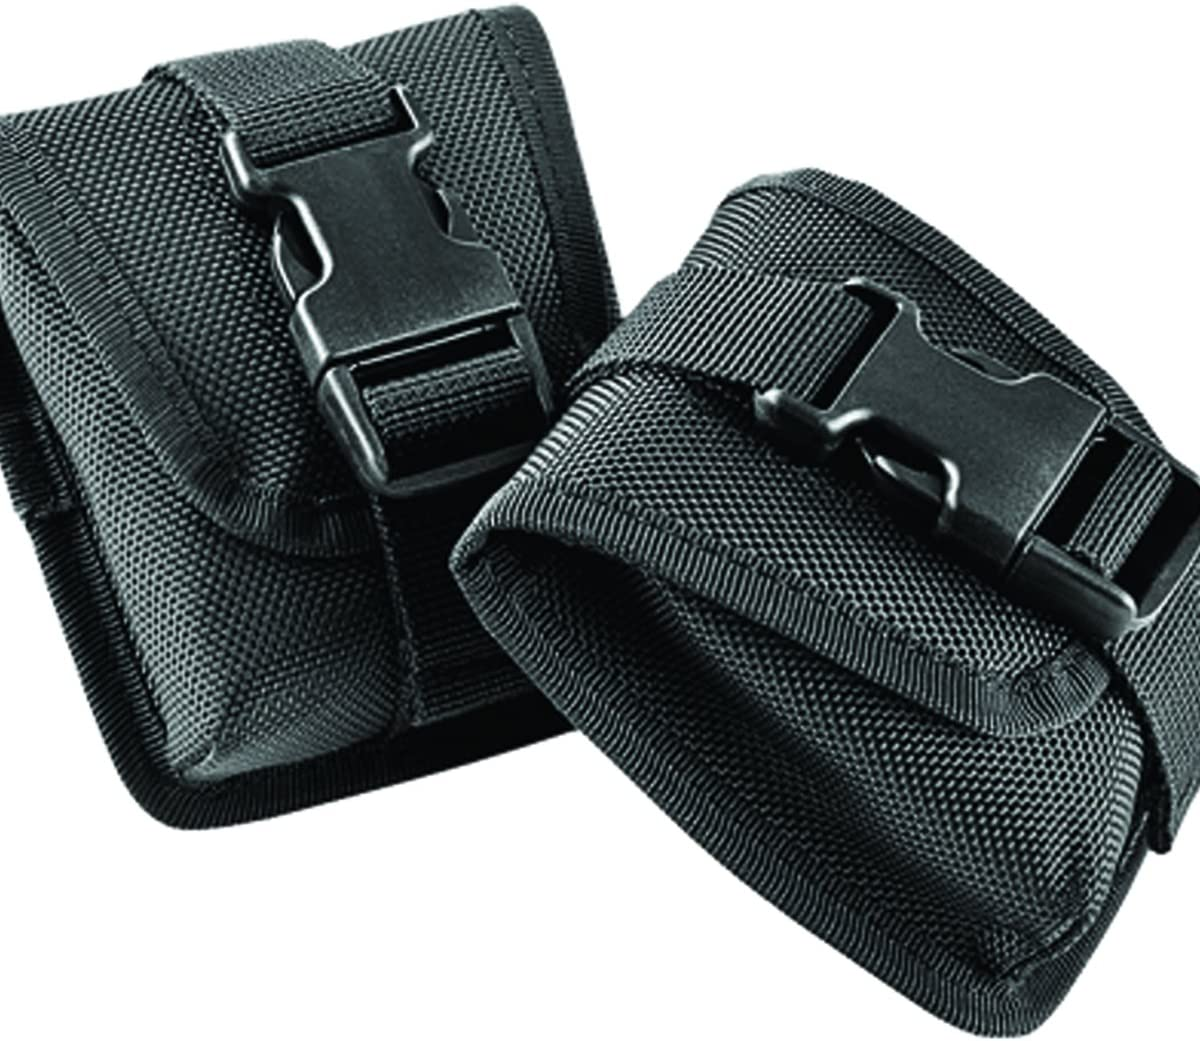 Scubapro unisex Max 81% OFF X-Tek Counter Pockets Pair Weight